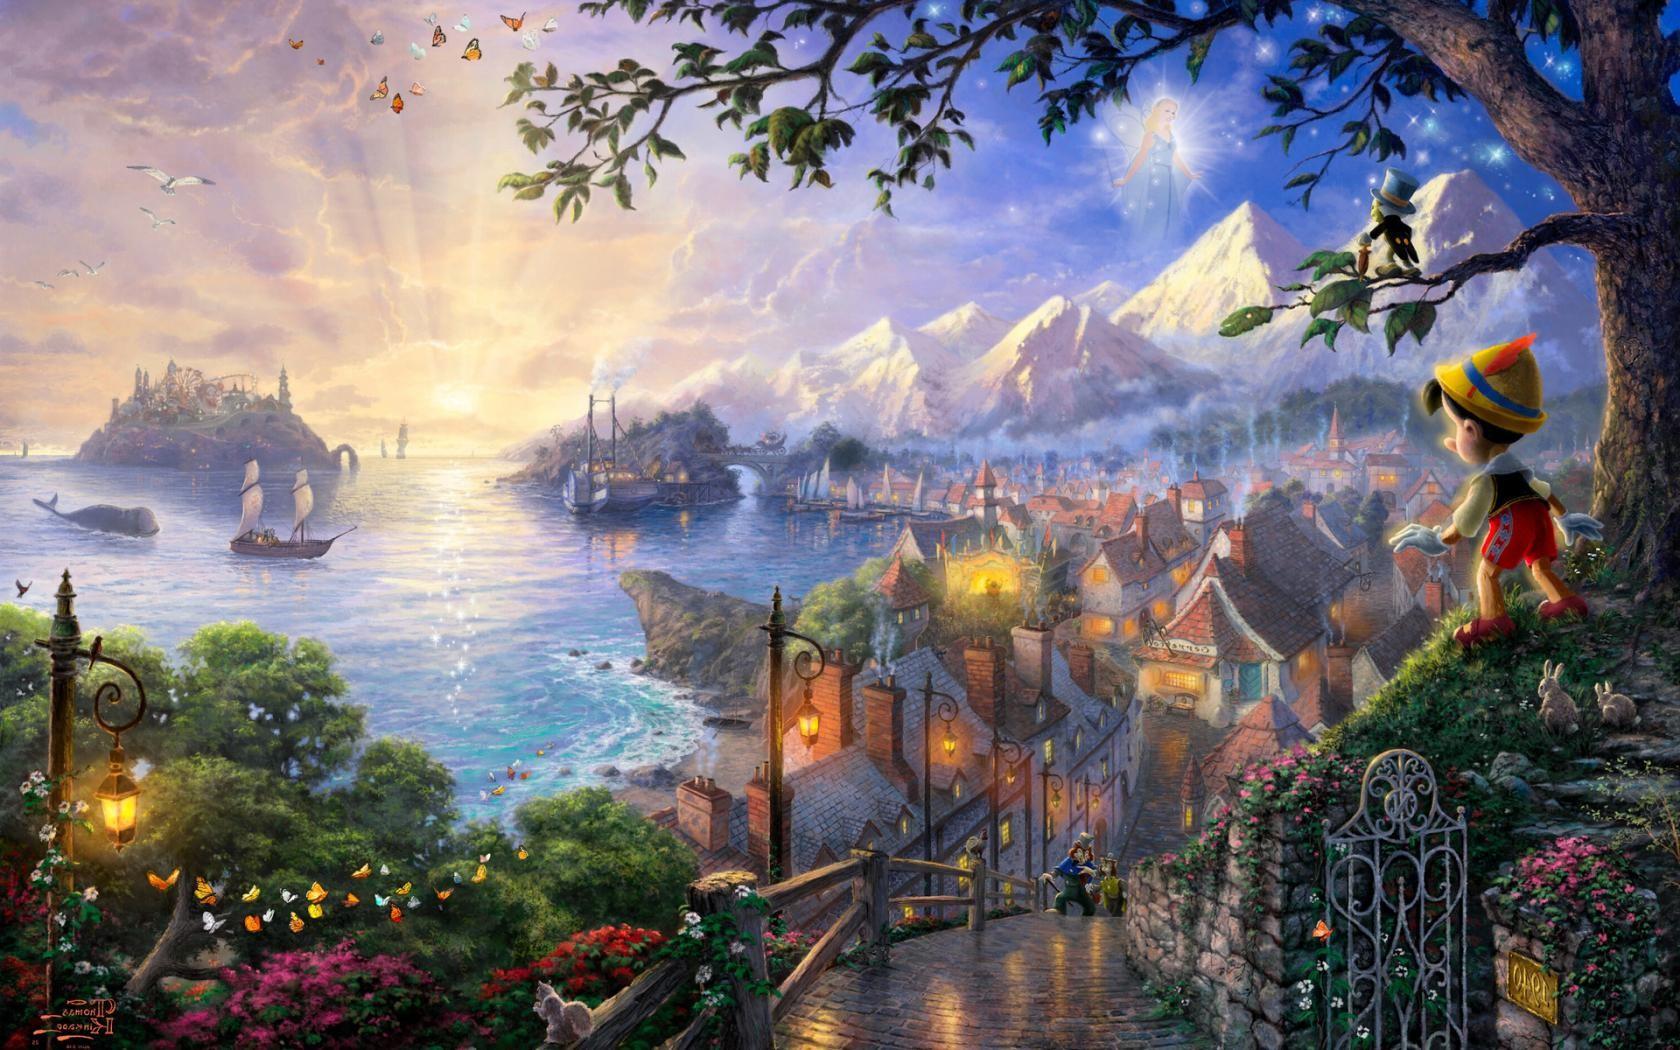 Disney Desktop Wallpaper Hd: [49+] Walt Disney Free Wallpaper On WallpaperSafari